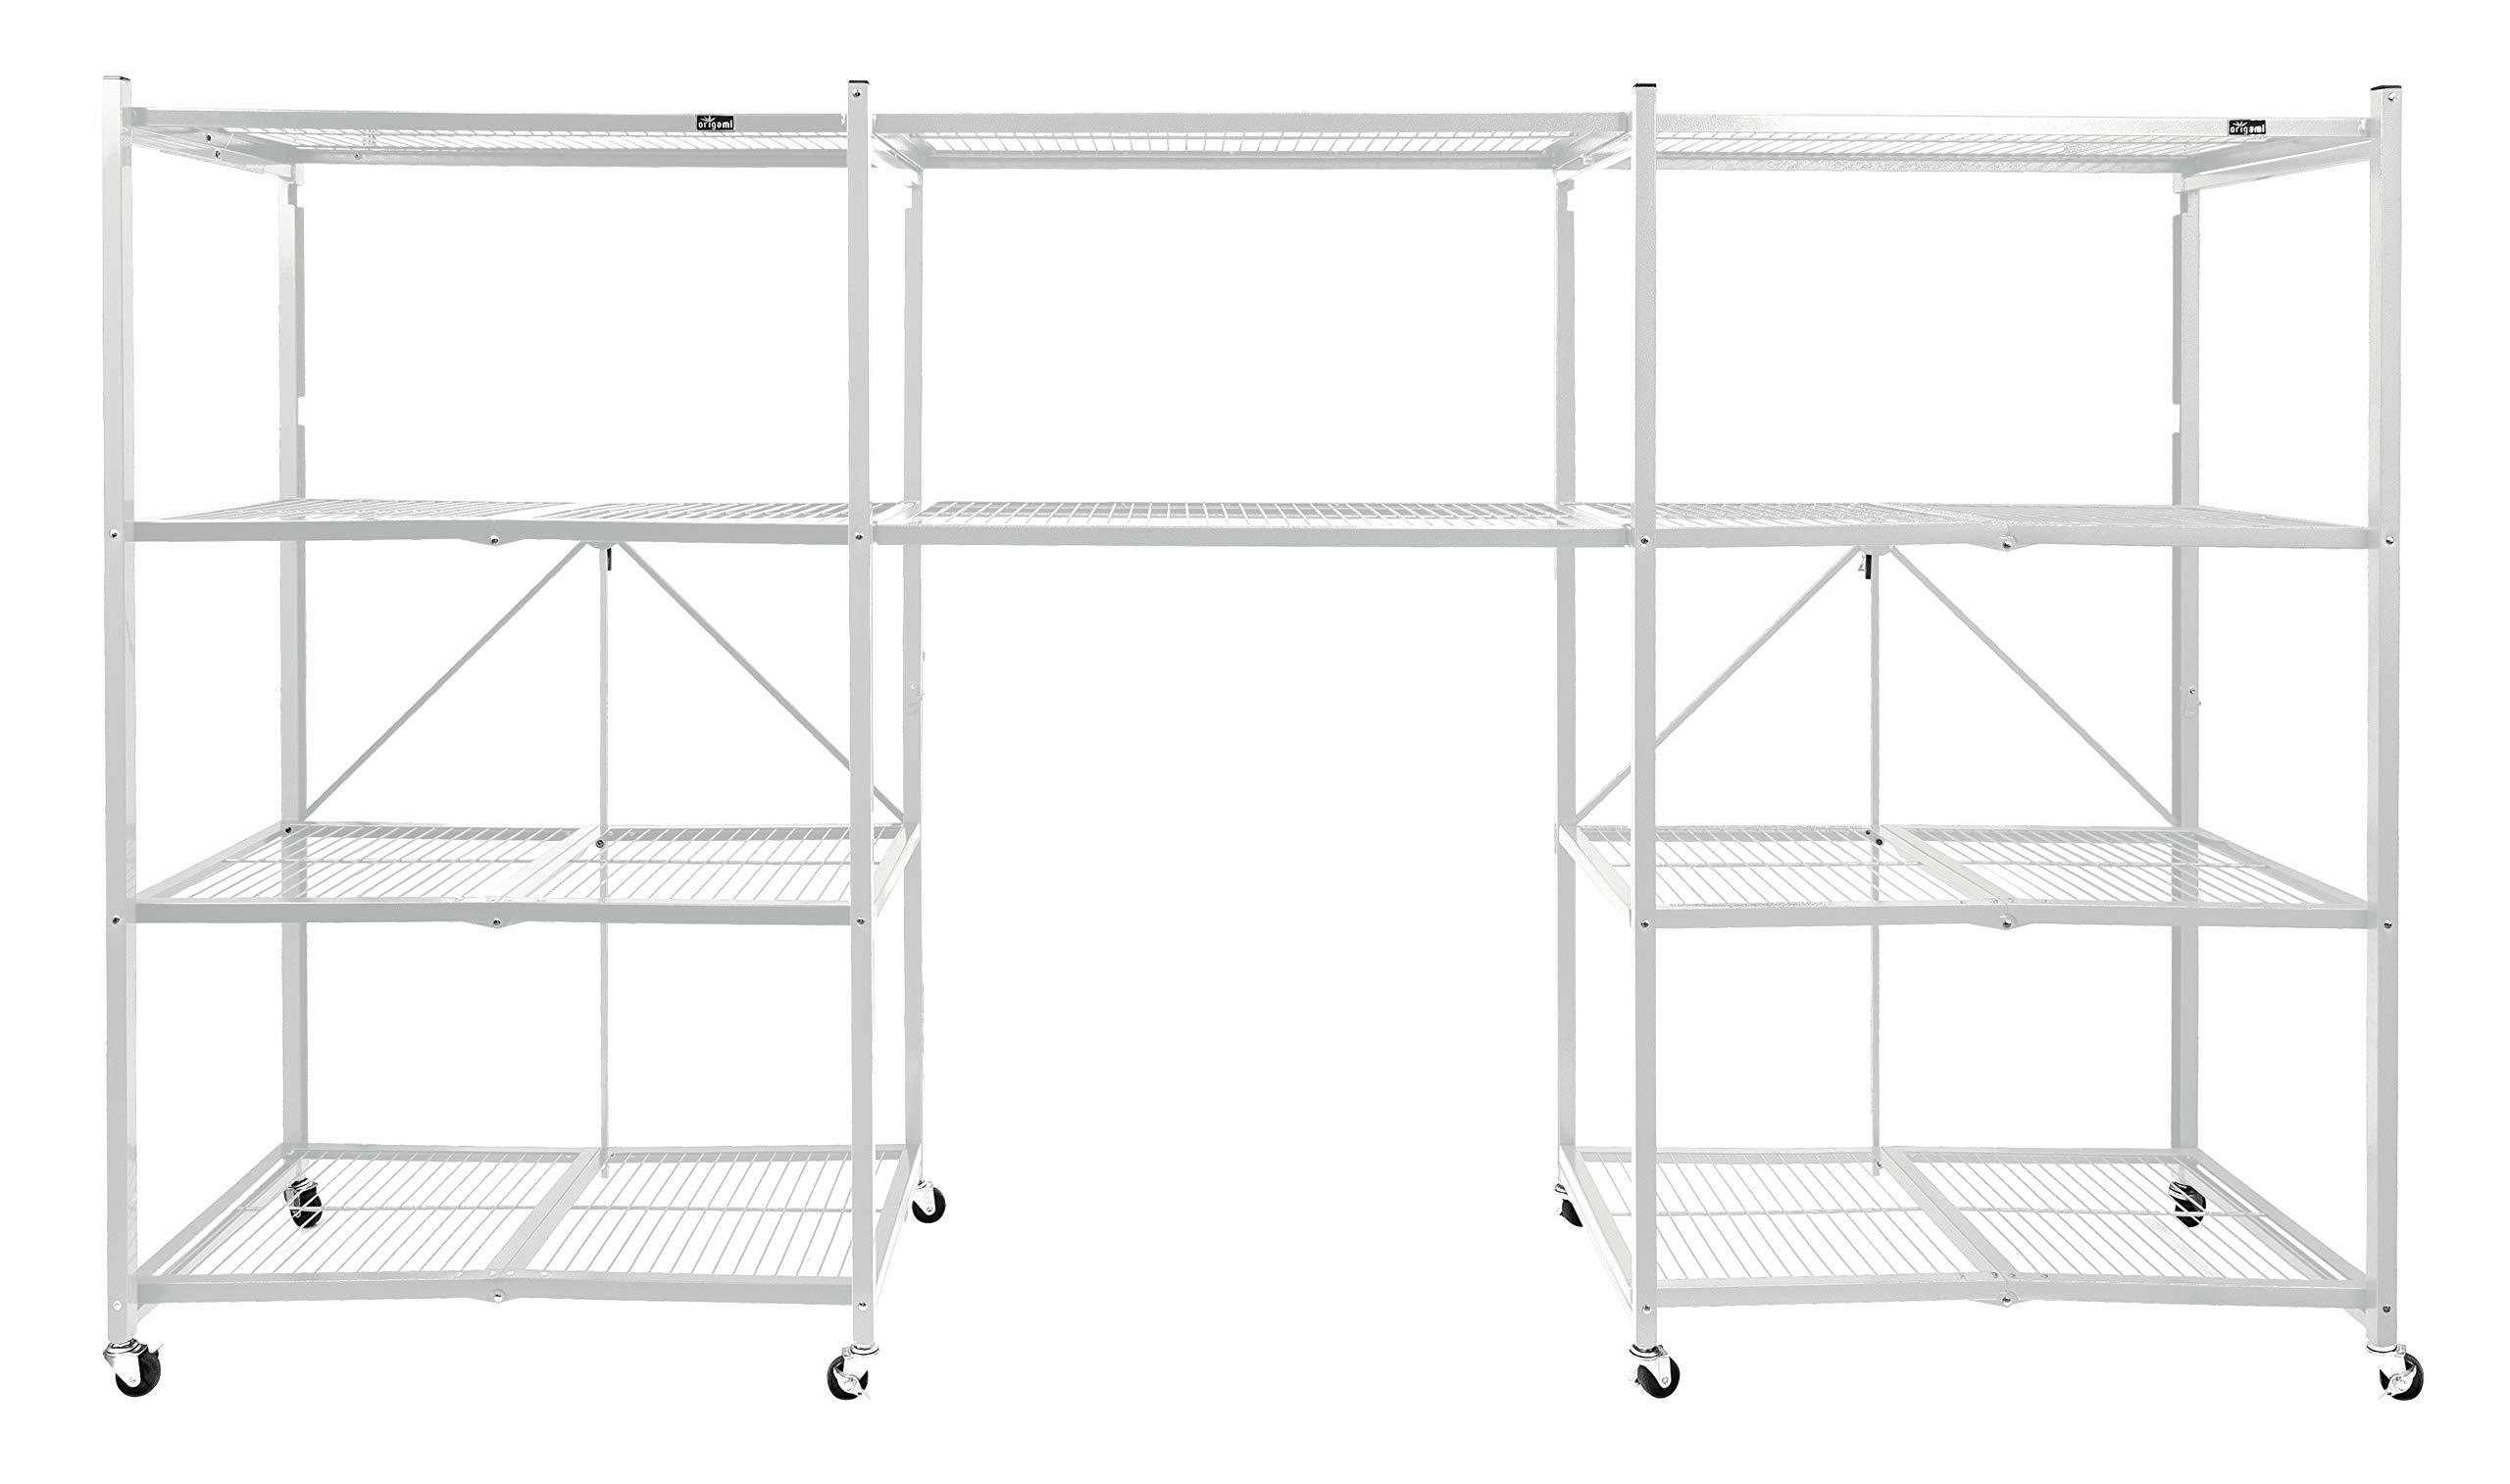 Origami Connection Bridge Racks for 4-Shelf Large Storage Rack (2 Pack) - White